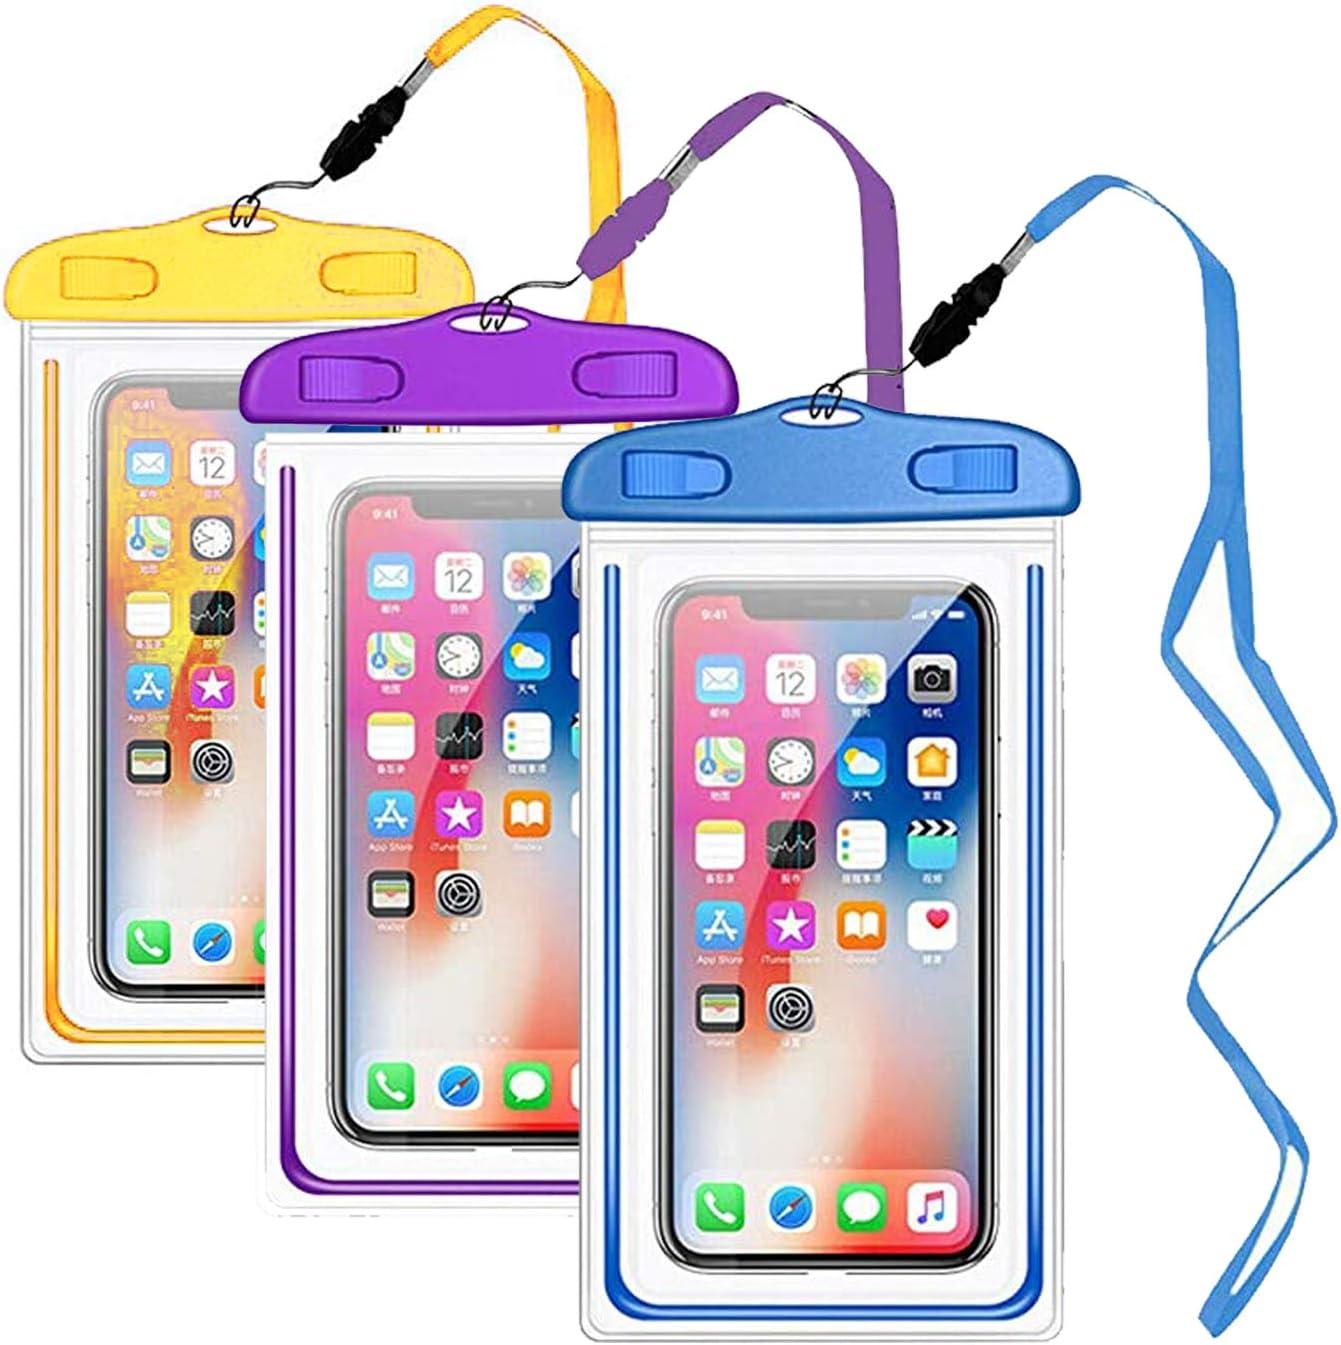 YOHOTA 3-Piece Waterproof Phone Pouch for Smart Phones Below 6.5 inches (Purple,YellowDark,Blue)